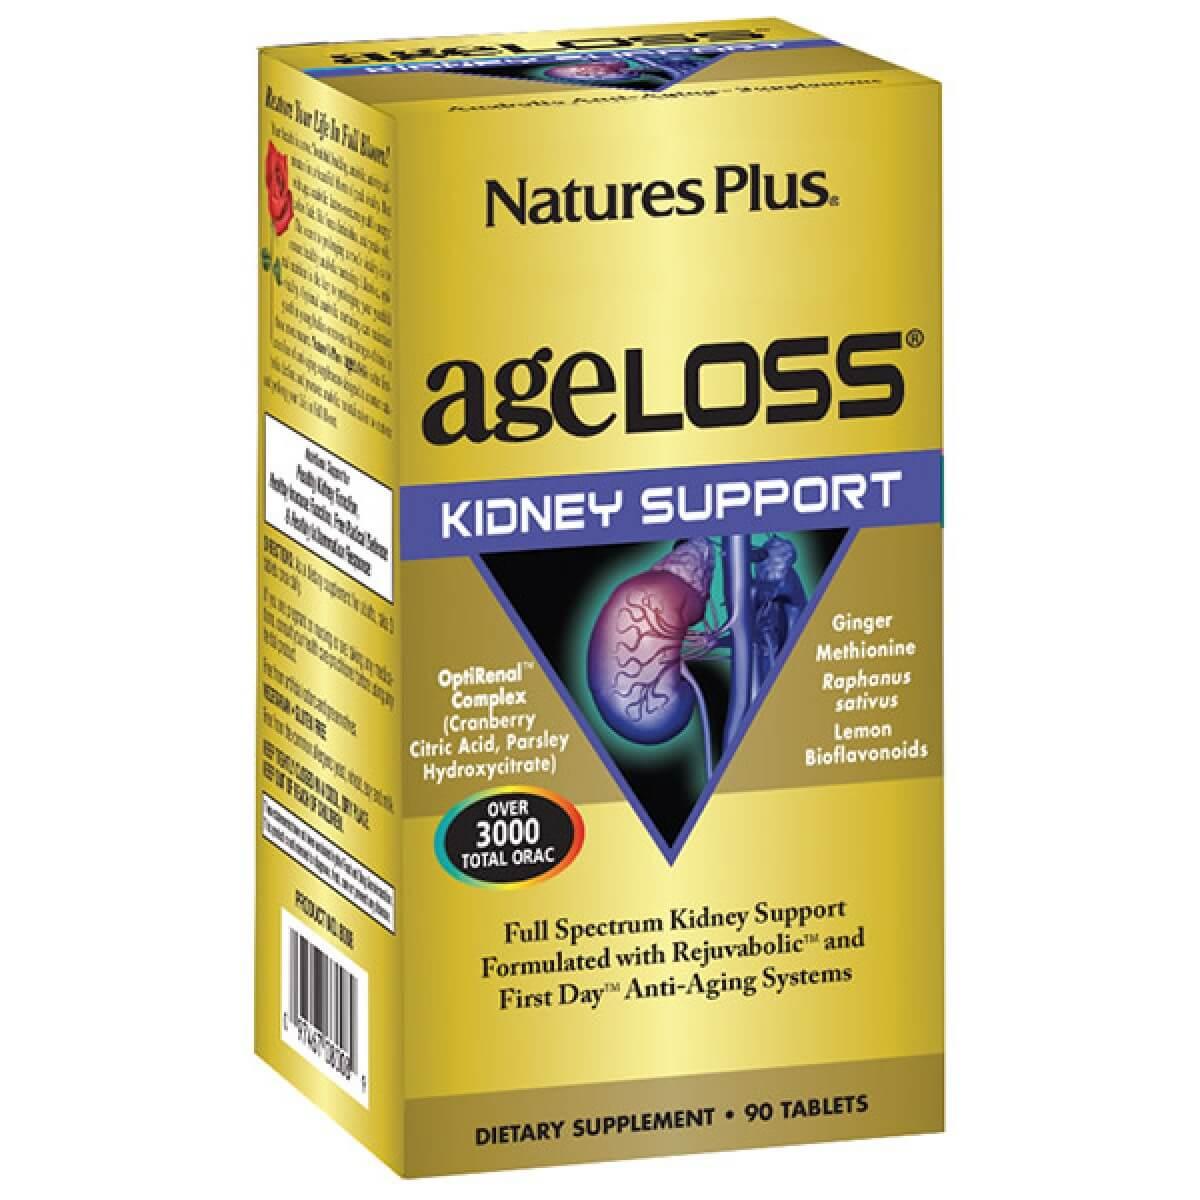 Natures Plus Ageloss Kidney Support 90 Συμπλήρωμα Διατροφής για την ΥποστήριξητωνΝεφρών90 Ταμπλέτες